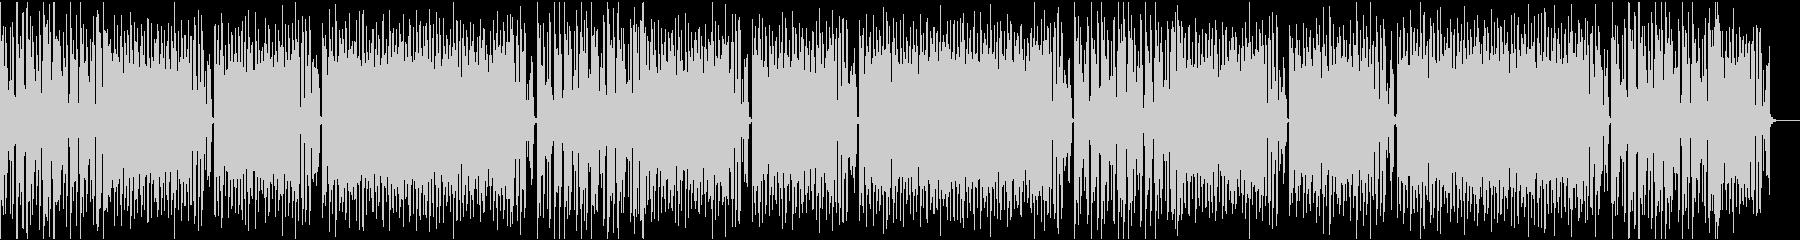 Comical / Karaoke's unreproduced waveform